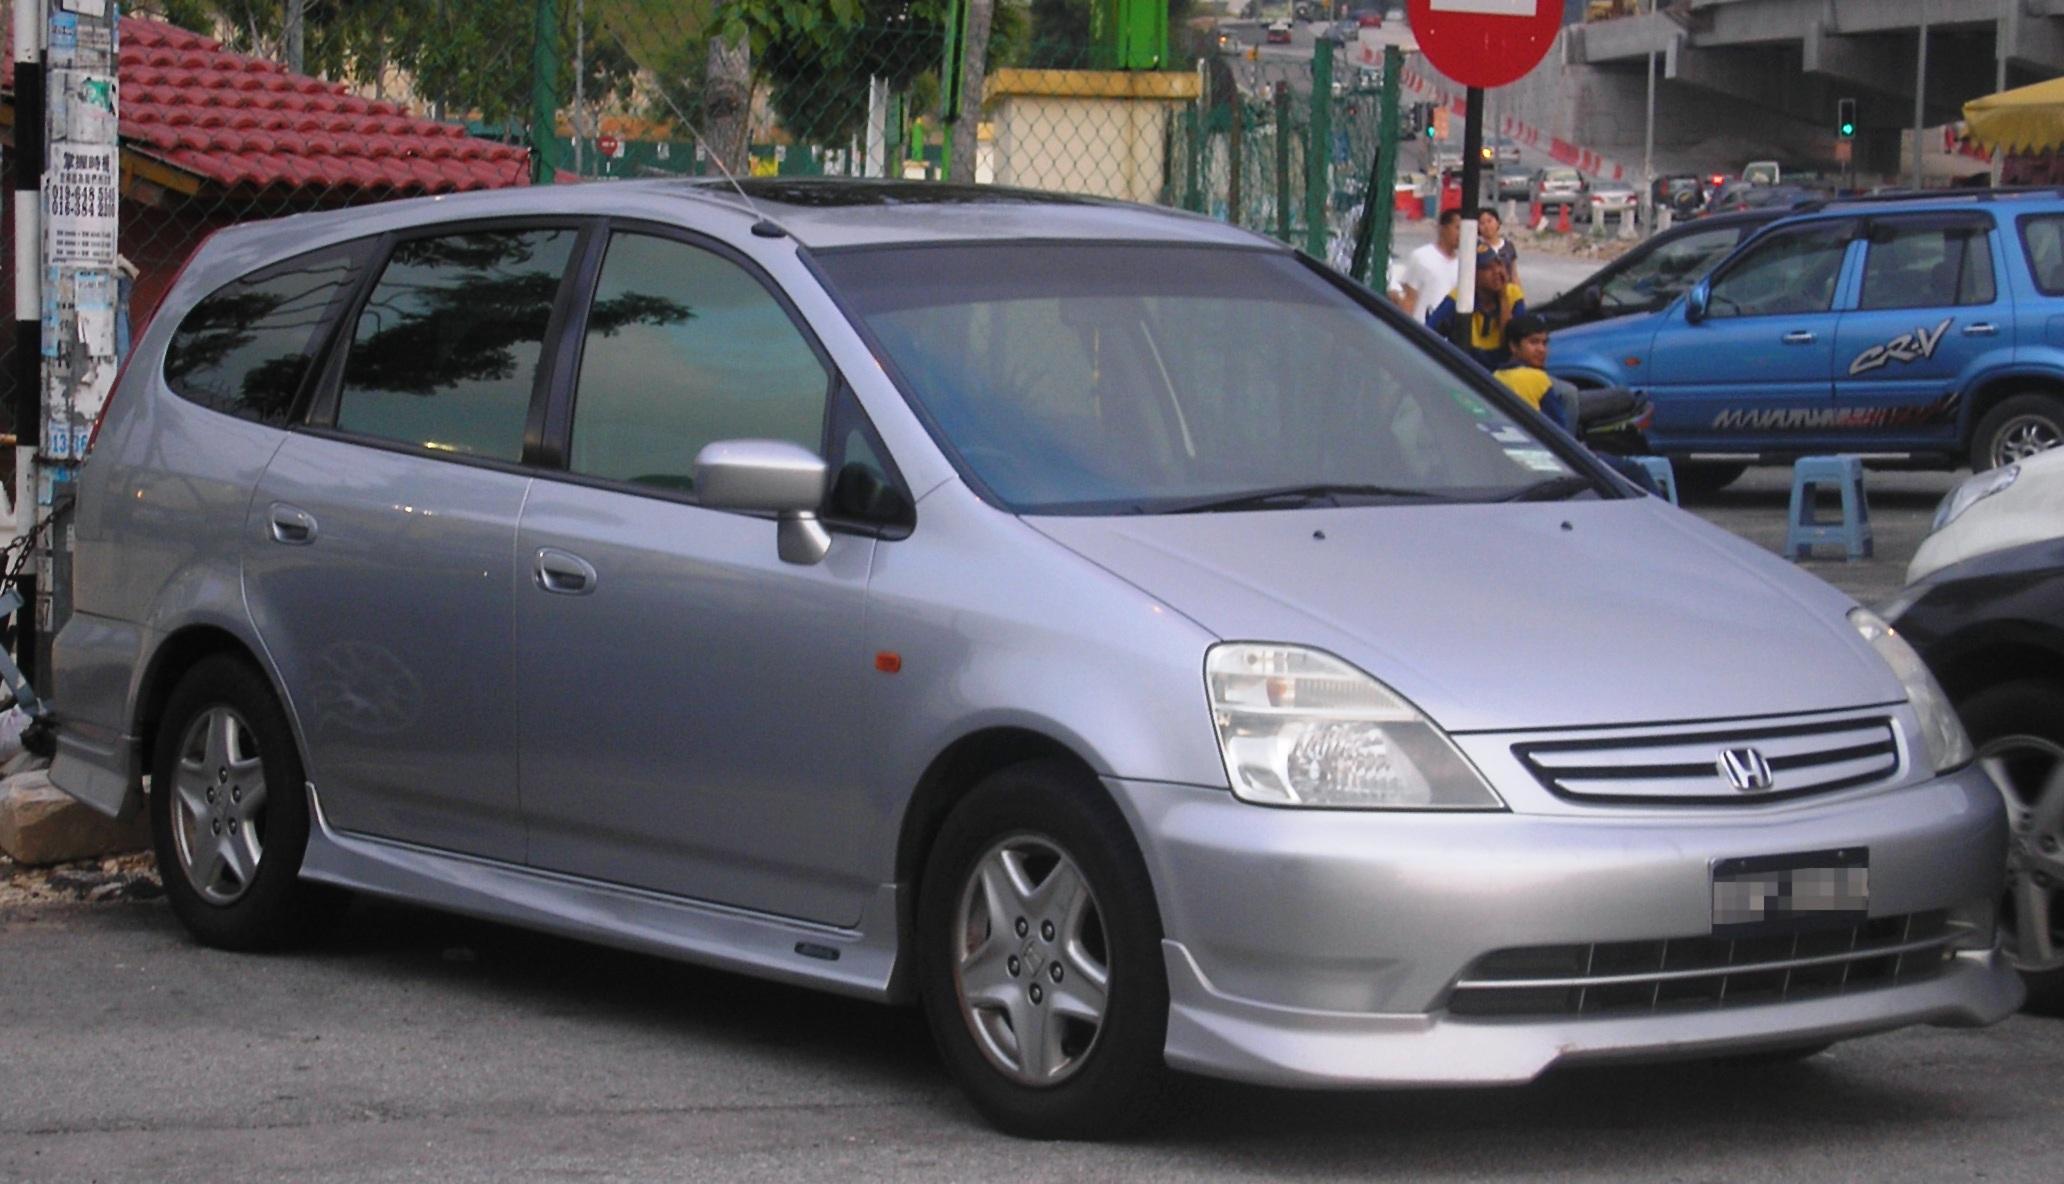 Fiche technique Honda Stream de 2001 à 2004